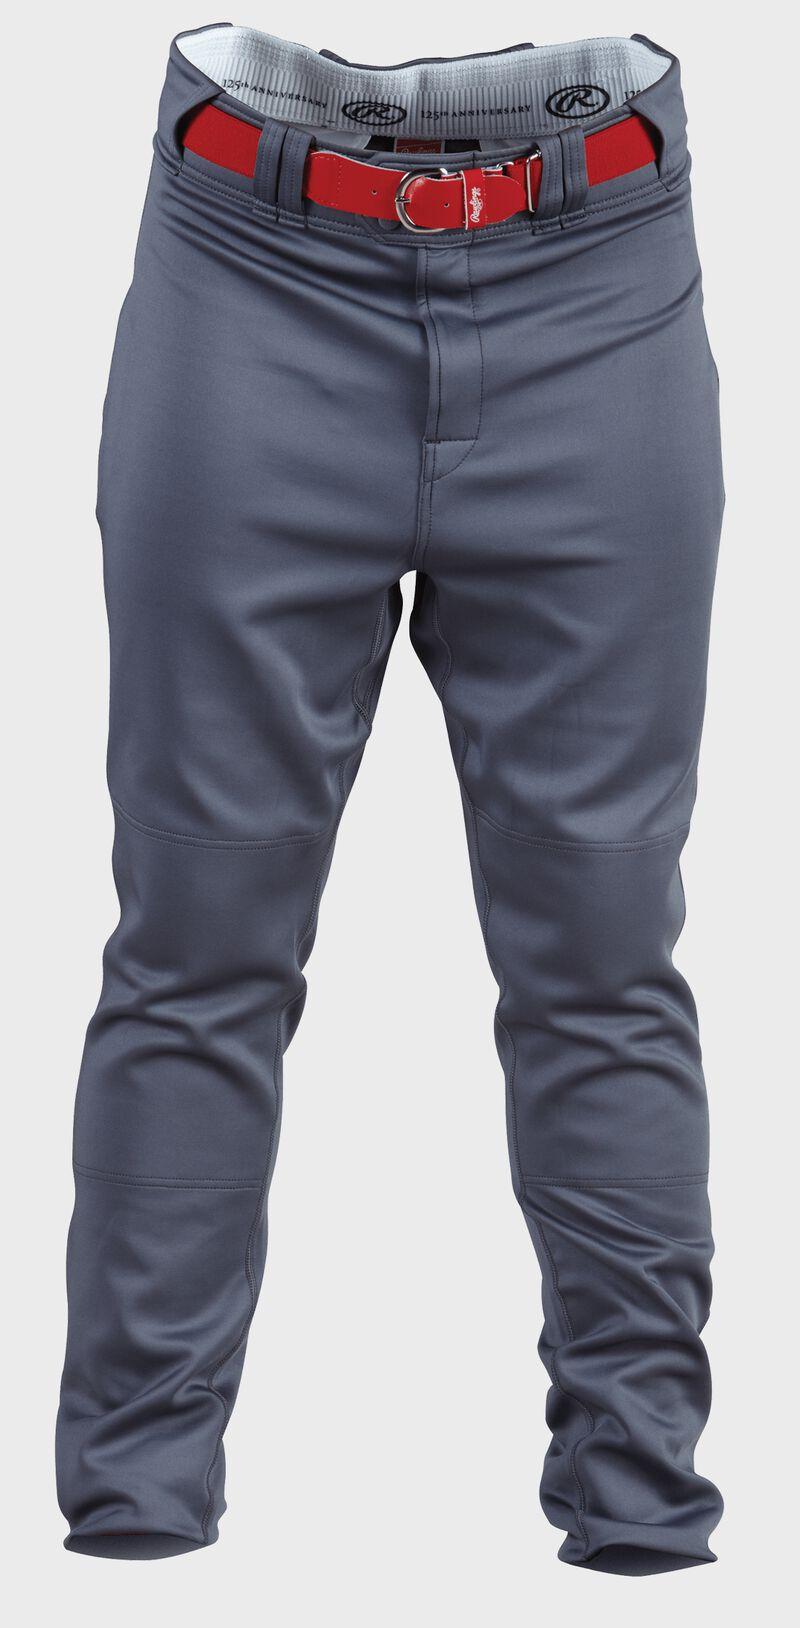 Front of Rawlings graphite Adult Premium Straight Baseball Pant - SKU #PPU140